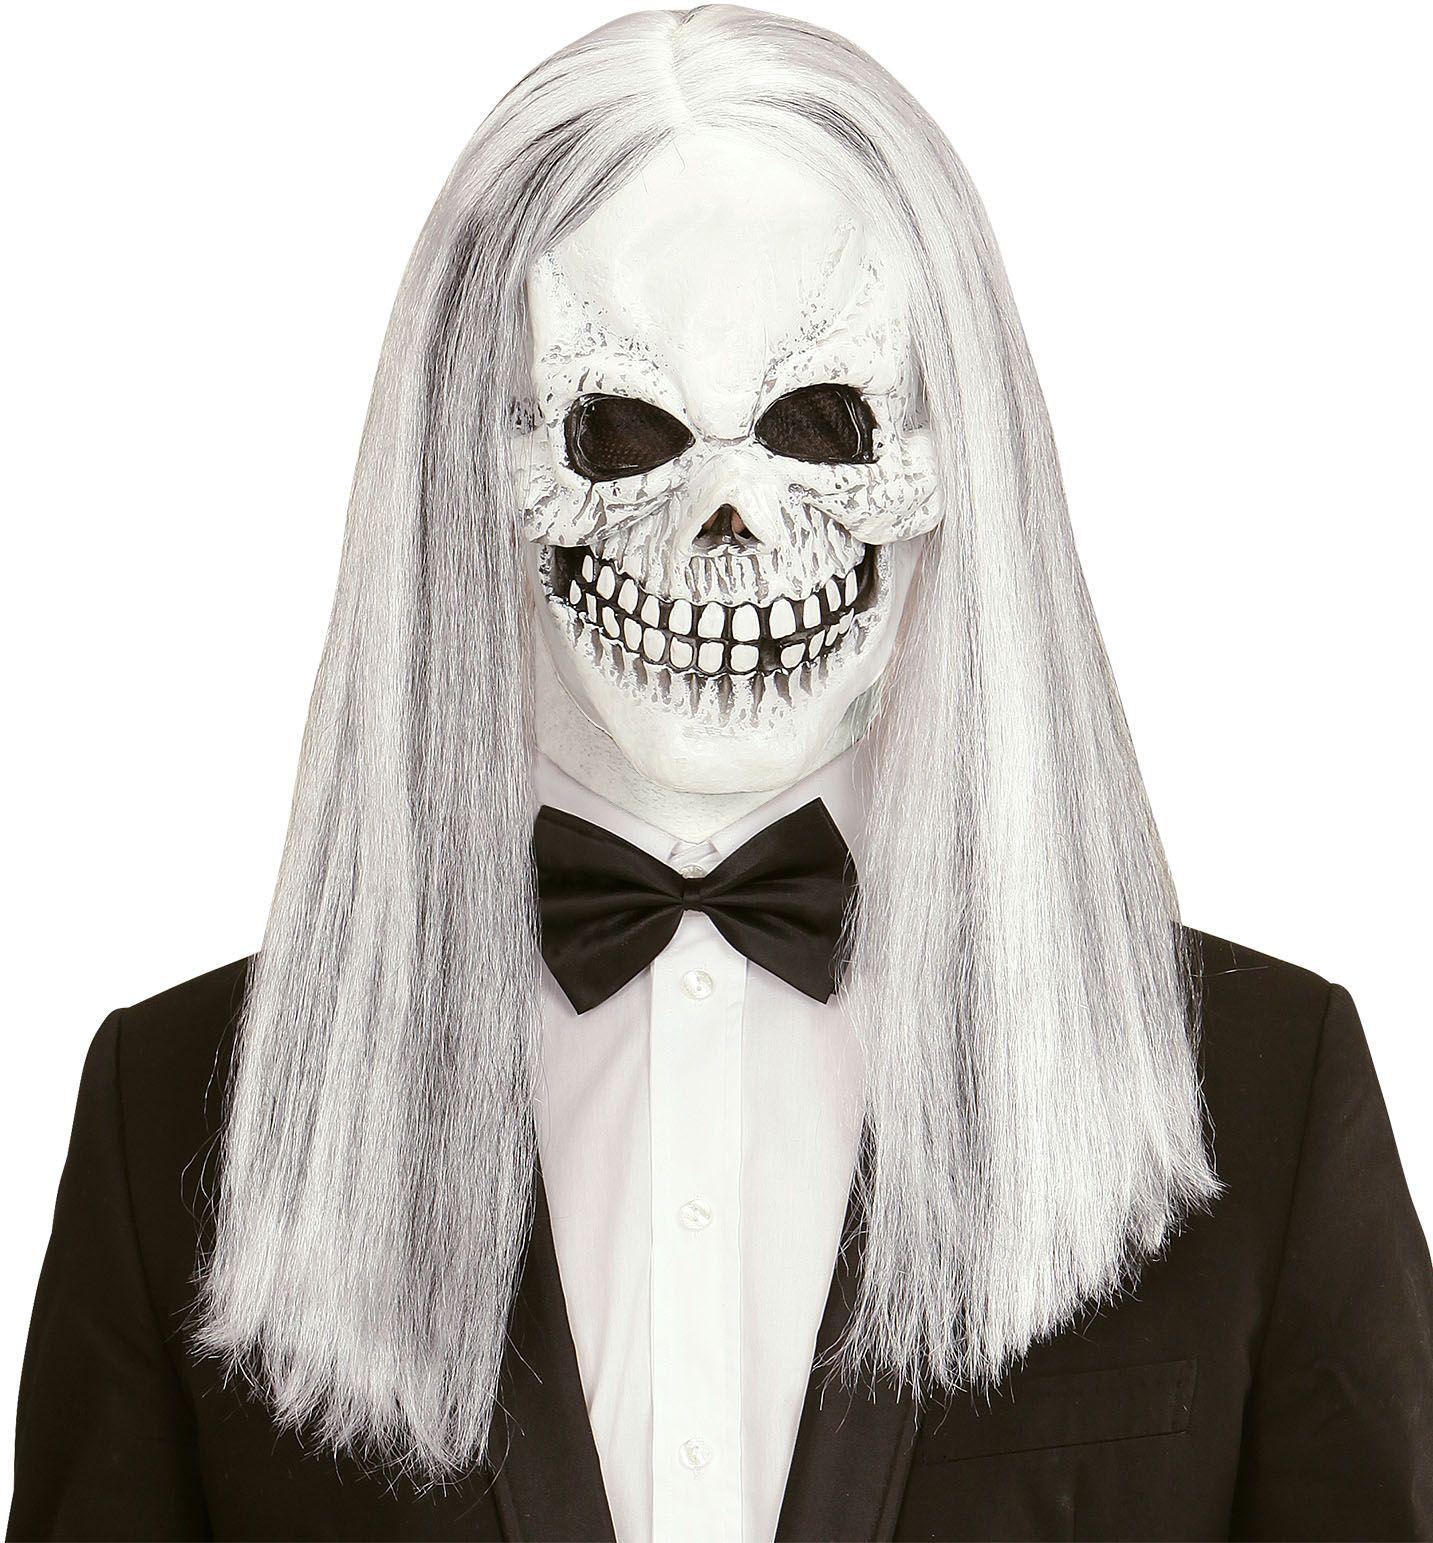 Schedel masker met pruik